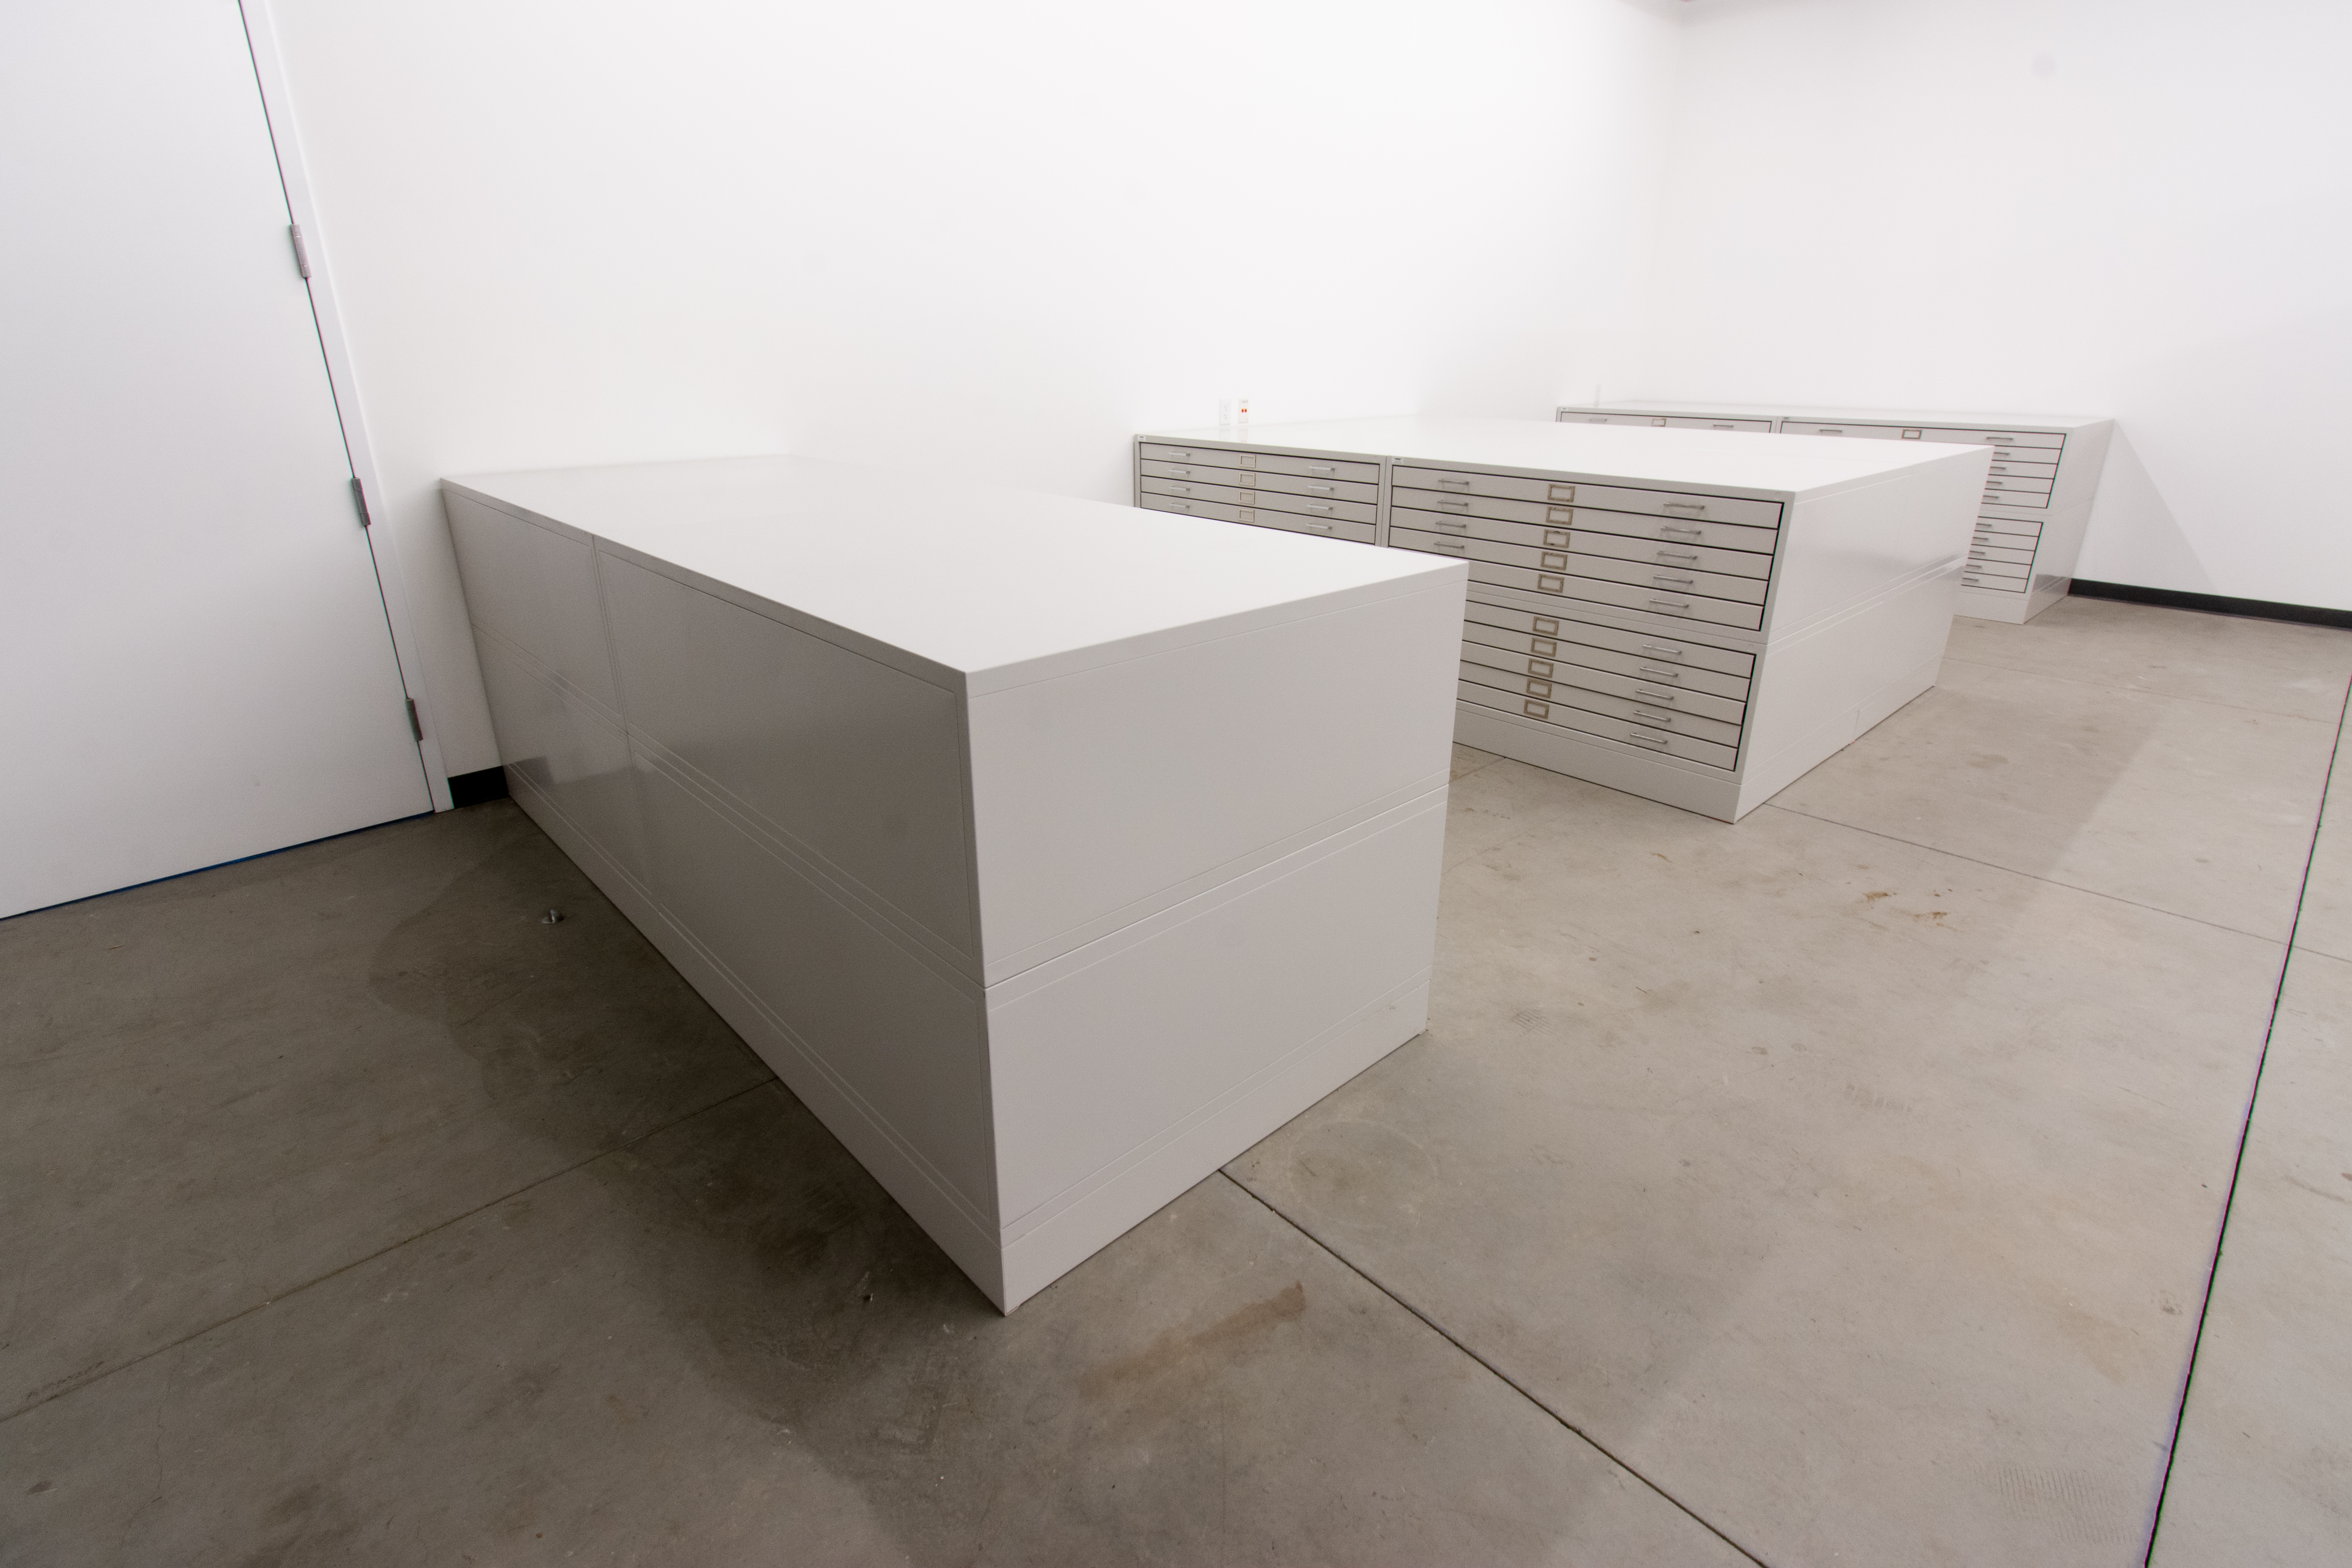 Benton Museum-Flat Files